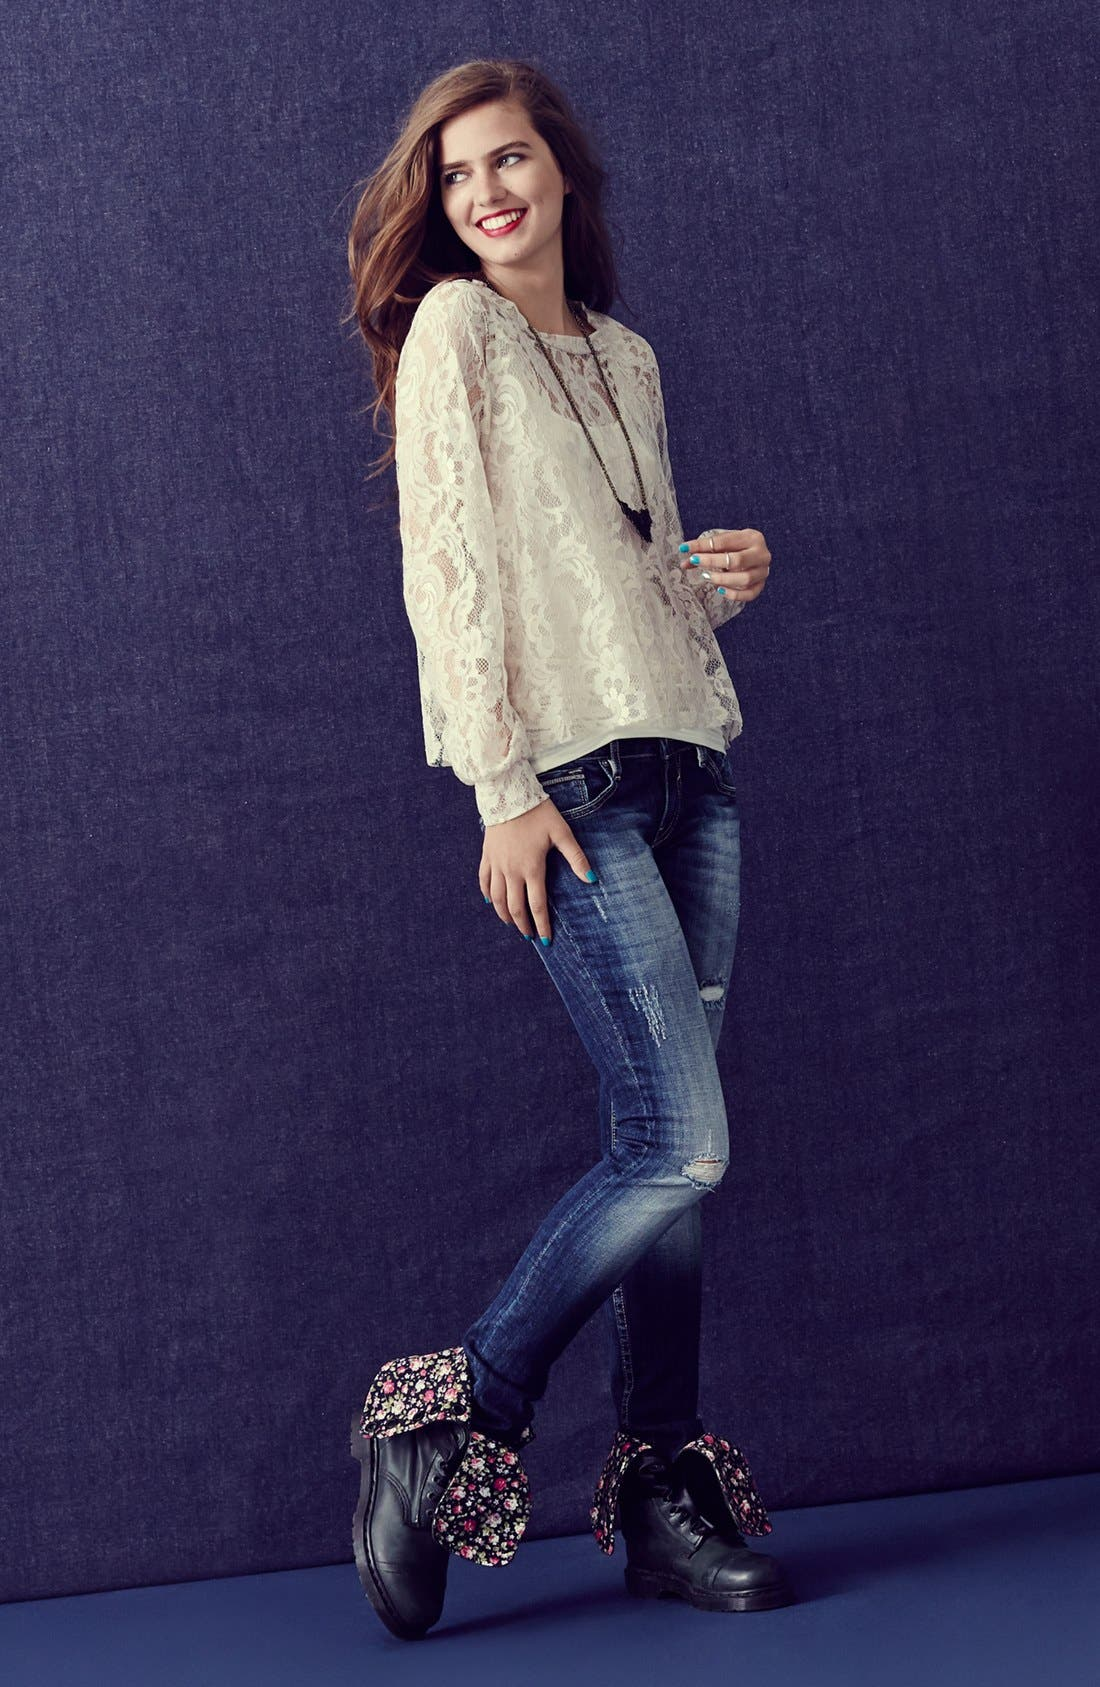 Main Image - Lily White Top & Vigoss Skinny Jeans